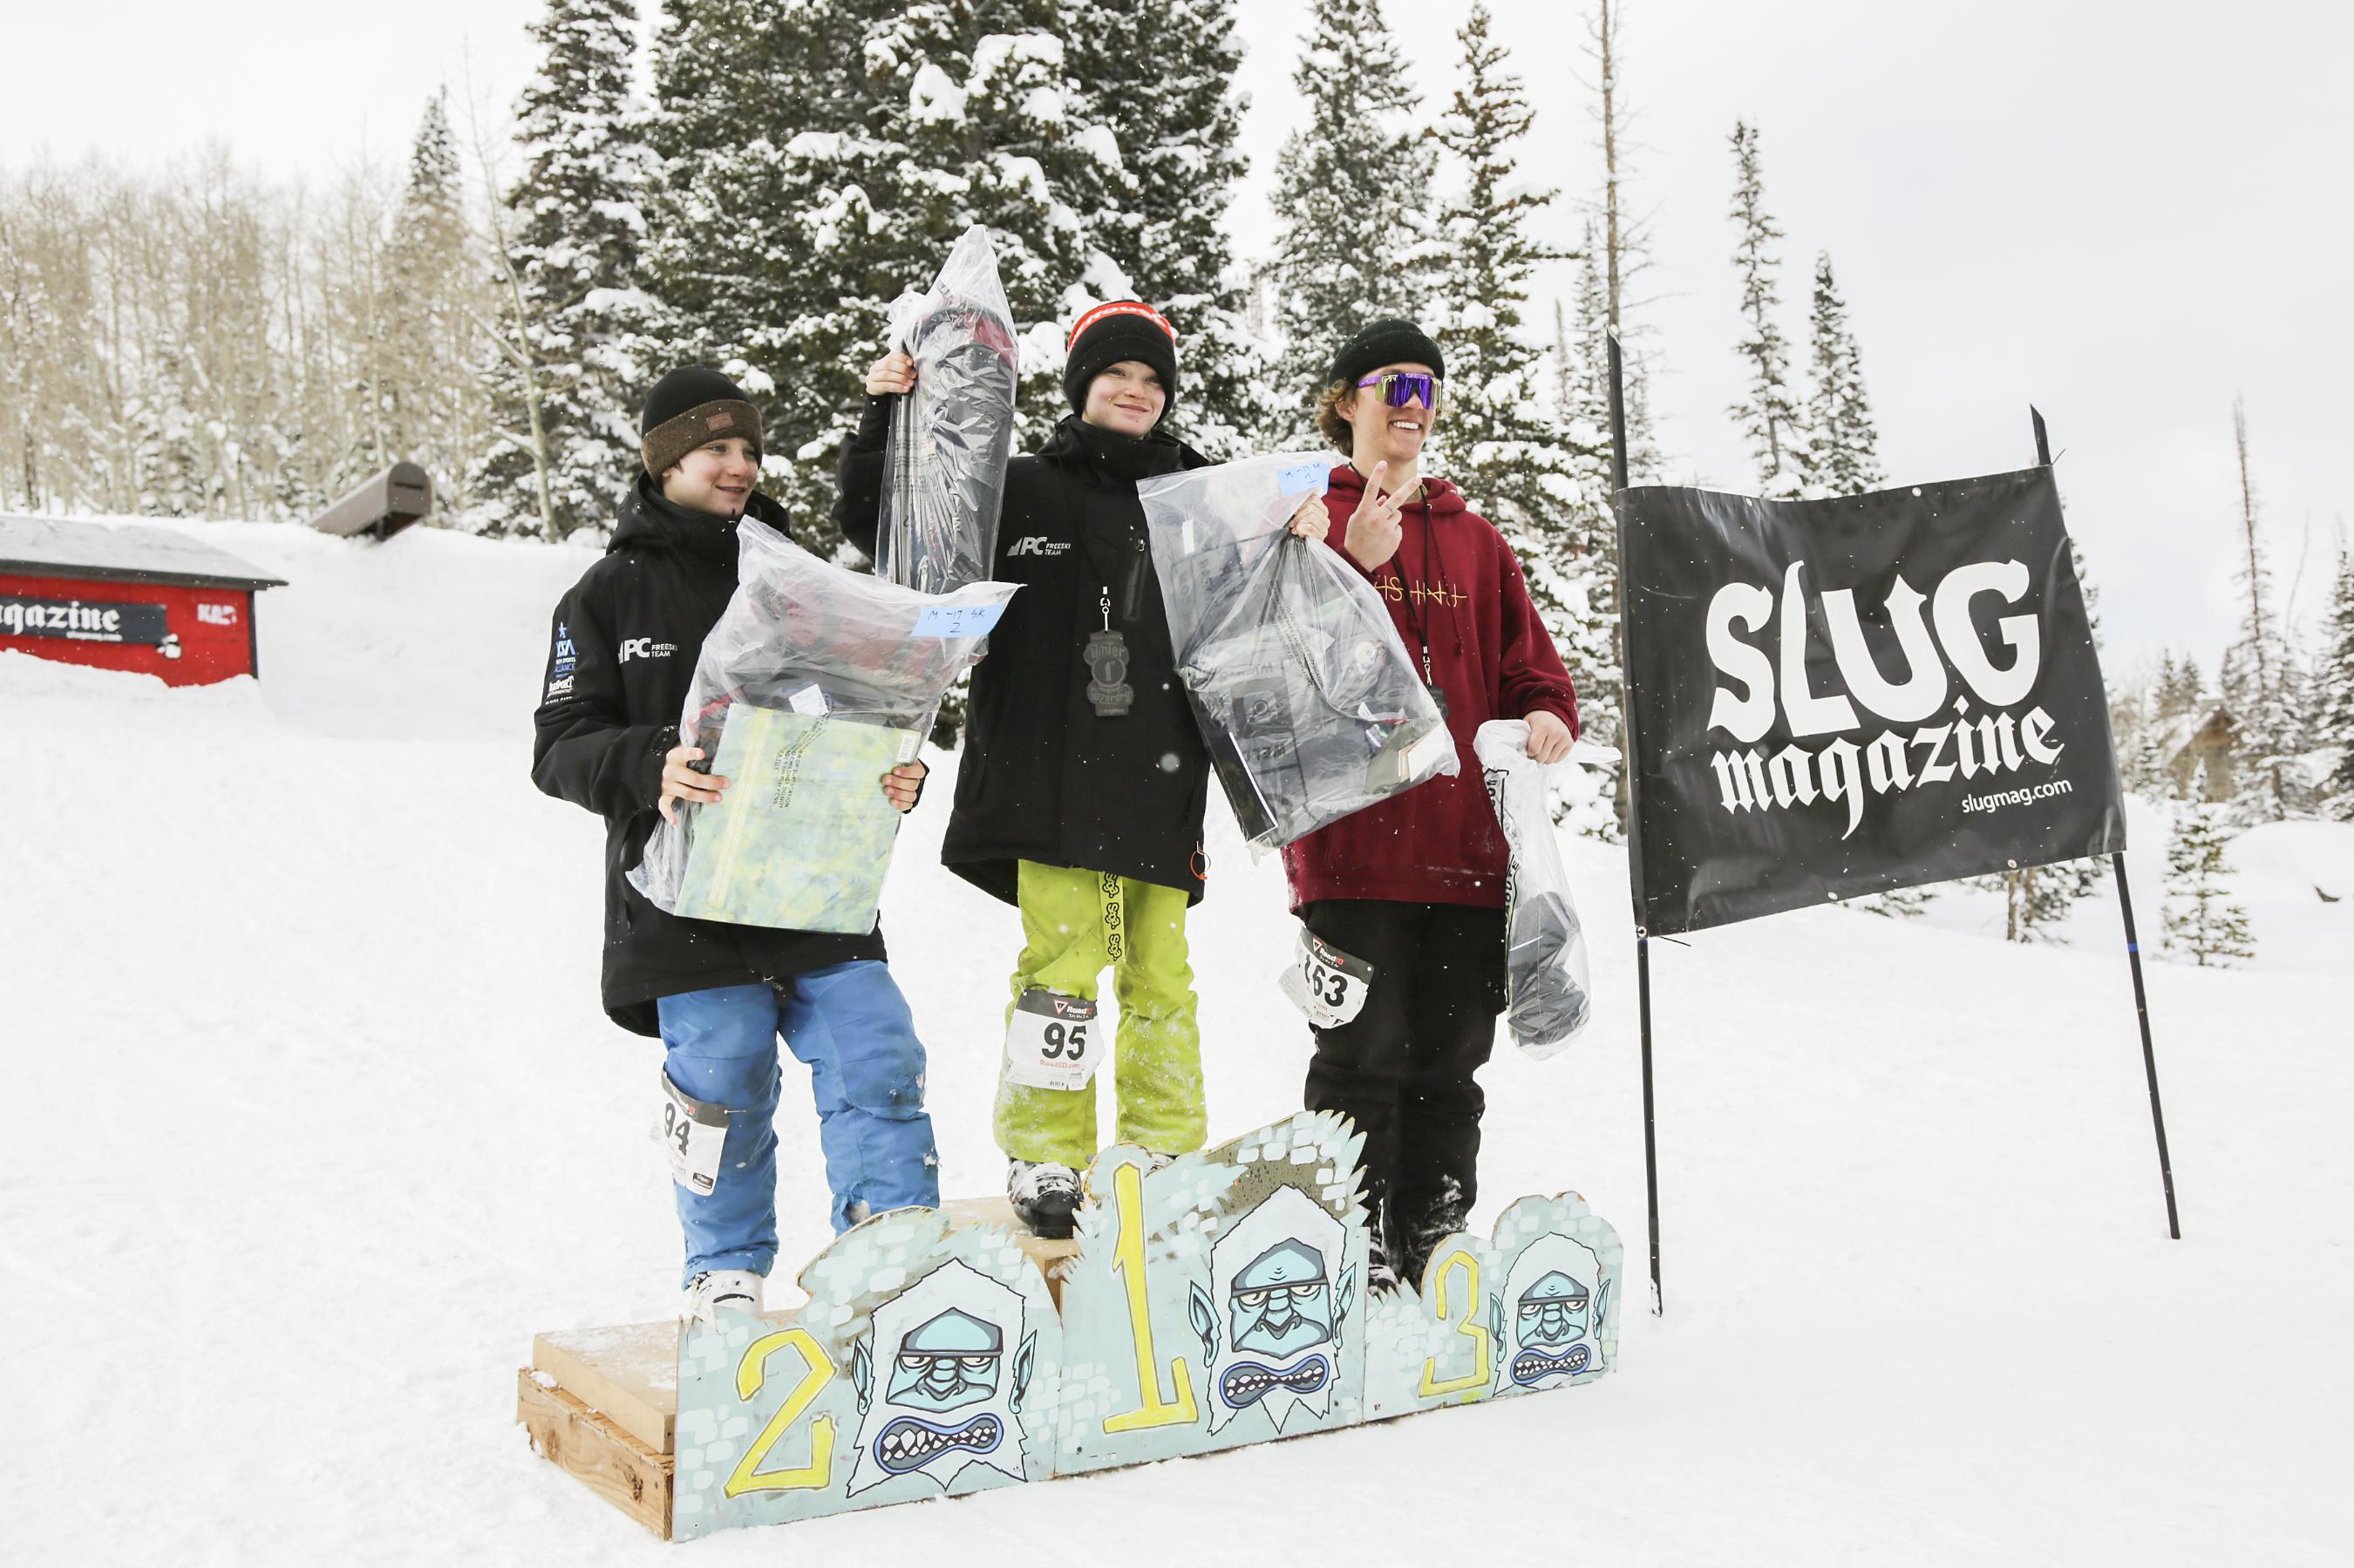 1st place winner of mens 17 & under ski Luke Mullan joins 2nd place winner Alex Mullen and 3rd place winner Jaxon Lewis on the podium.